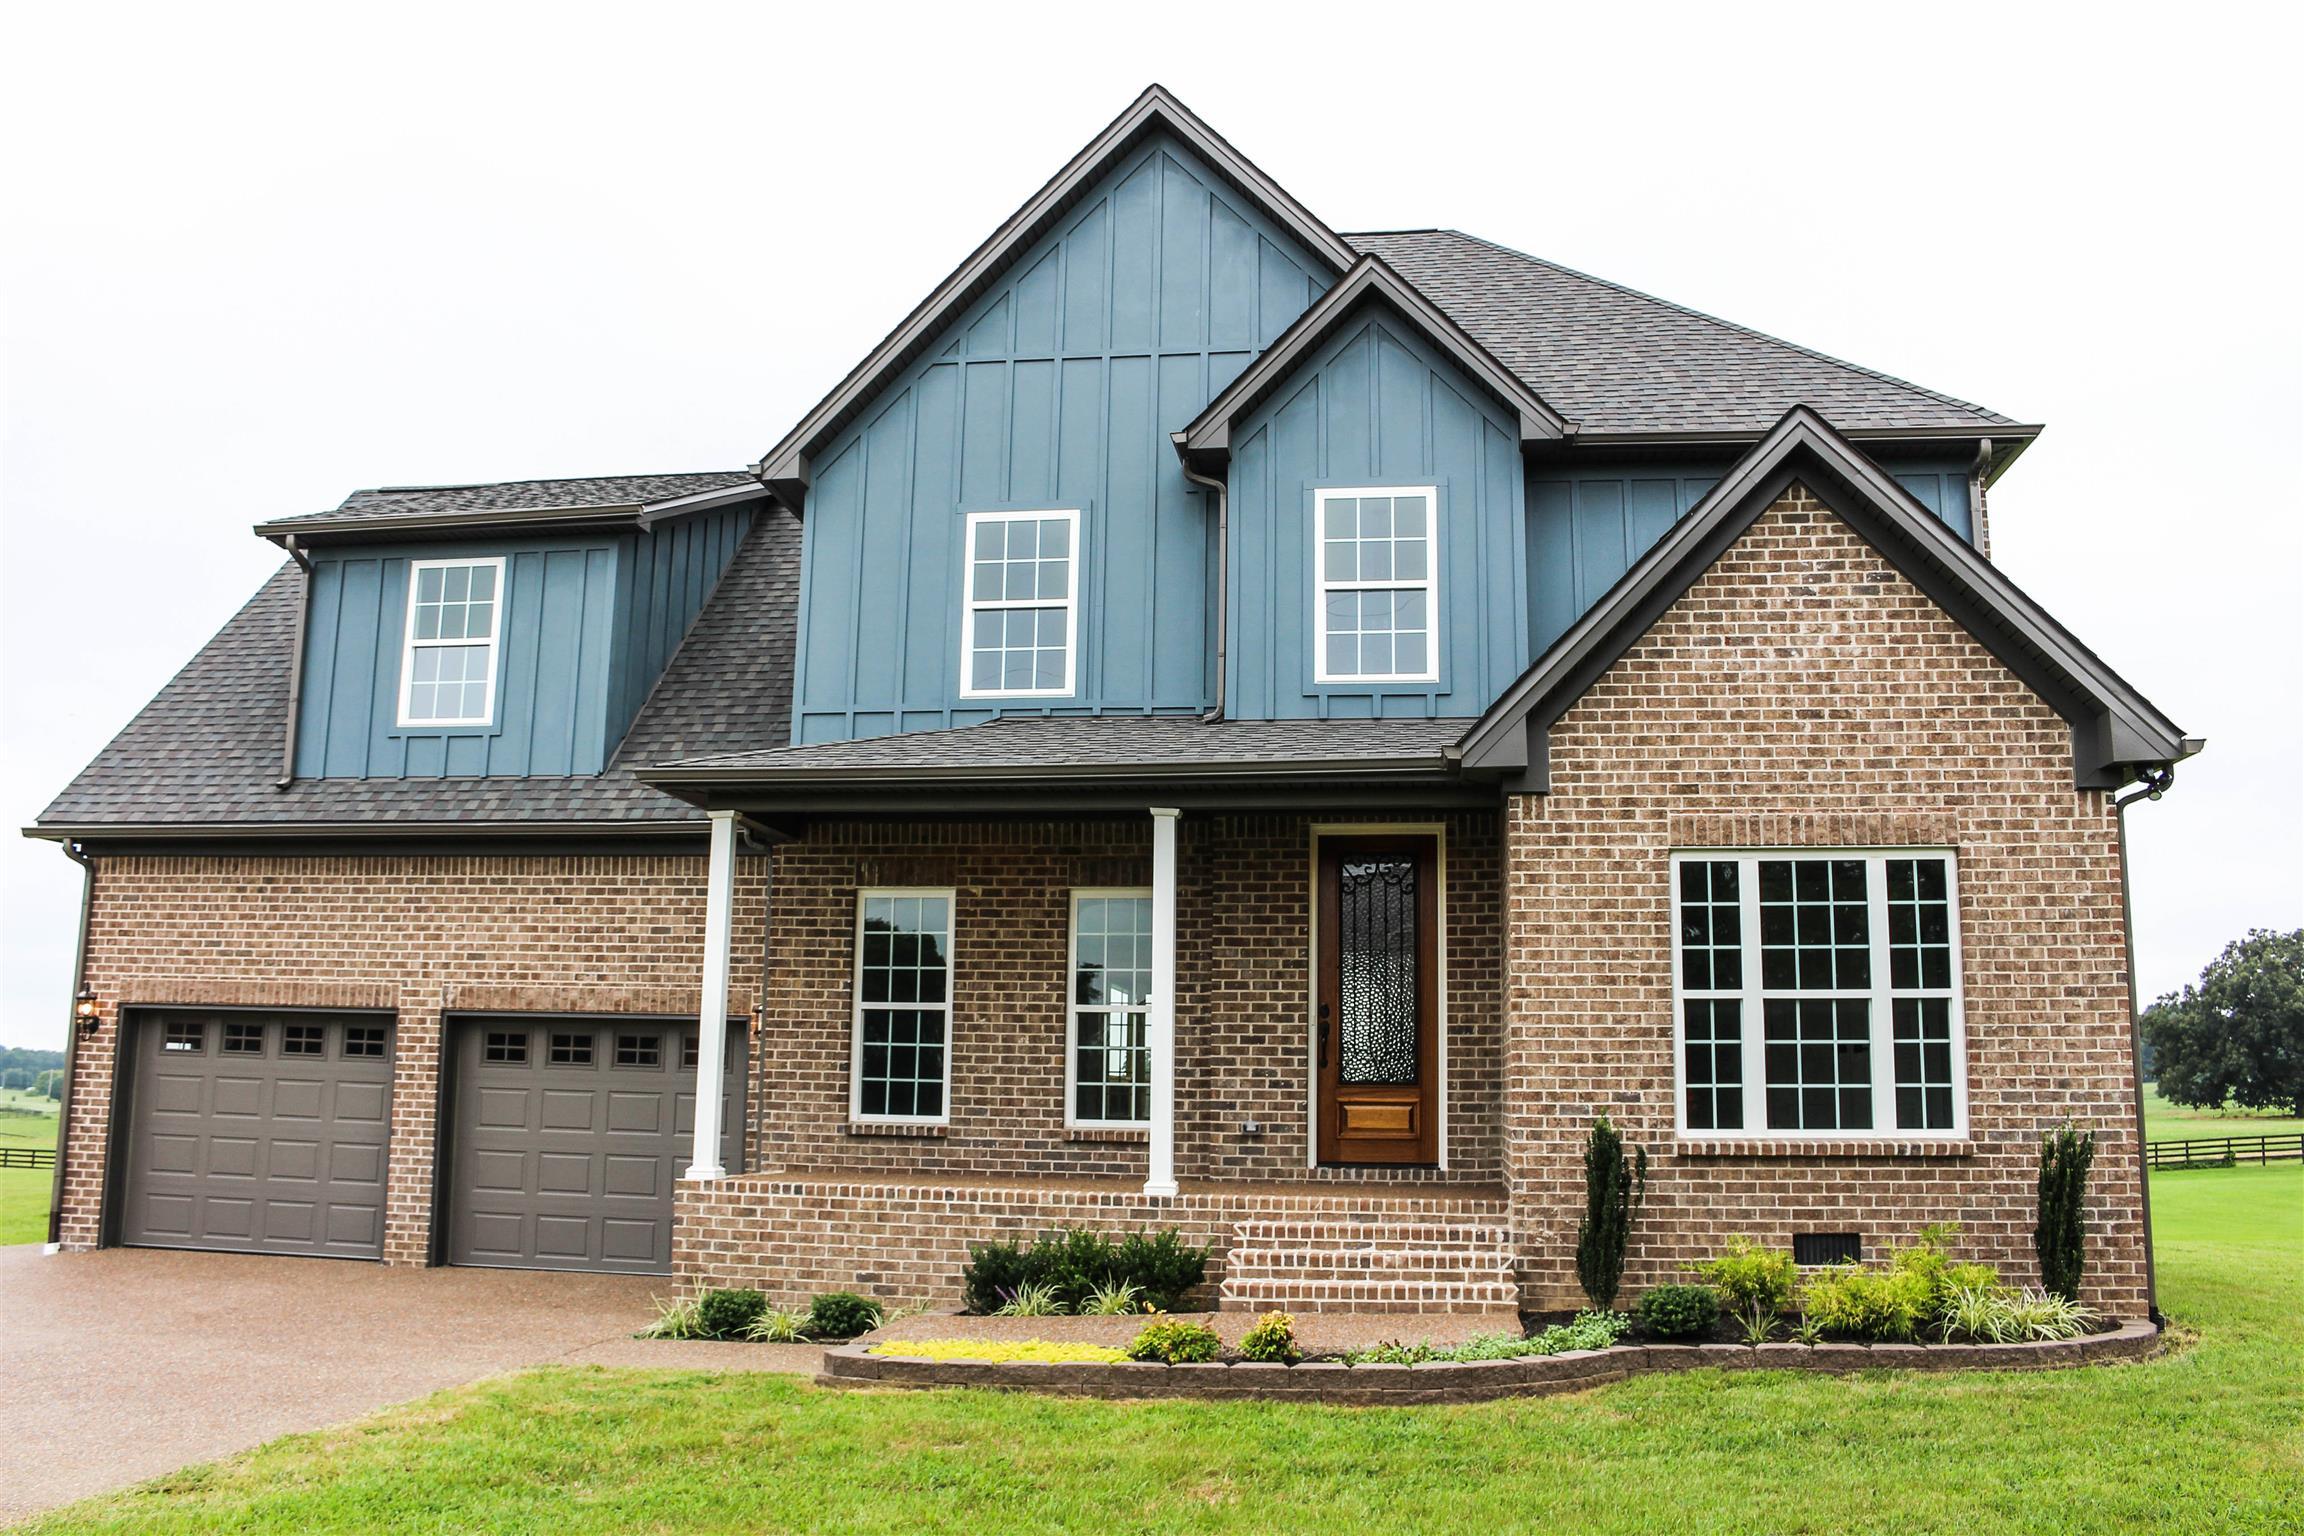 $389,000 - 4Br/3Ba -  for Sale in Kamber Leigh Est Sec 2, Cedar Hill